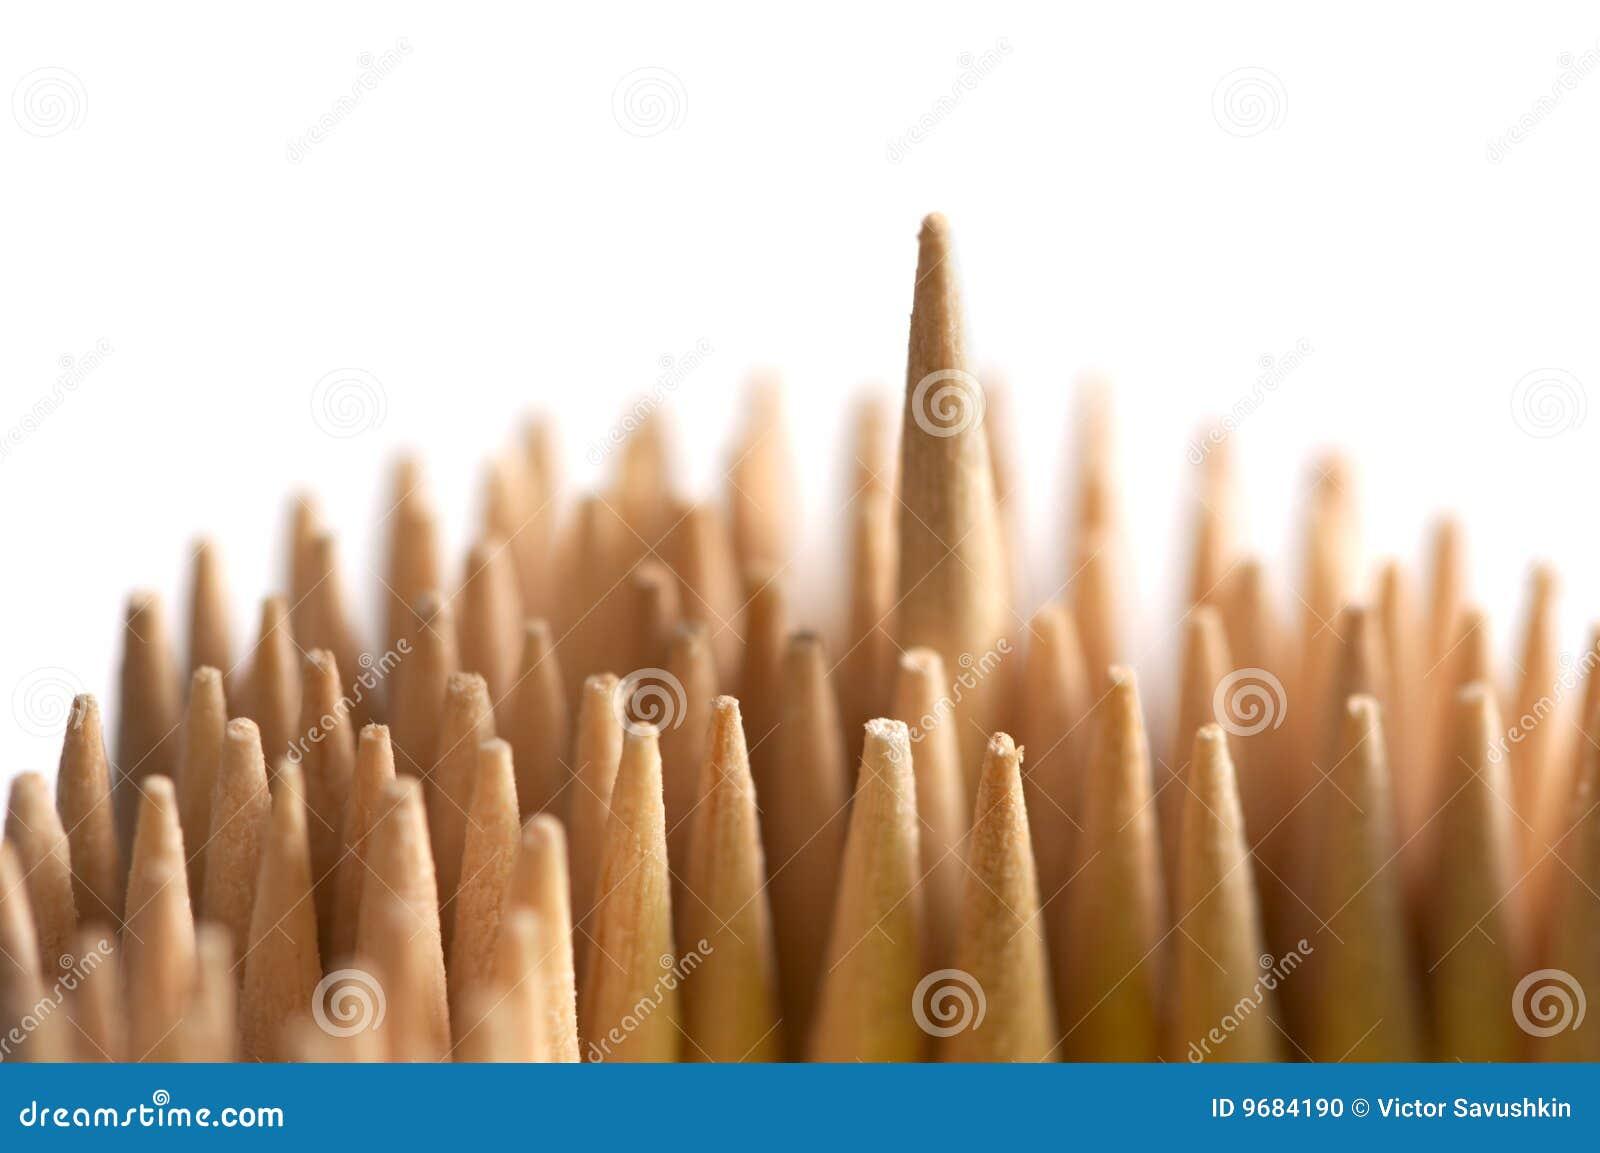 Toothpick (uno diferente)